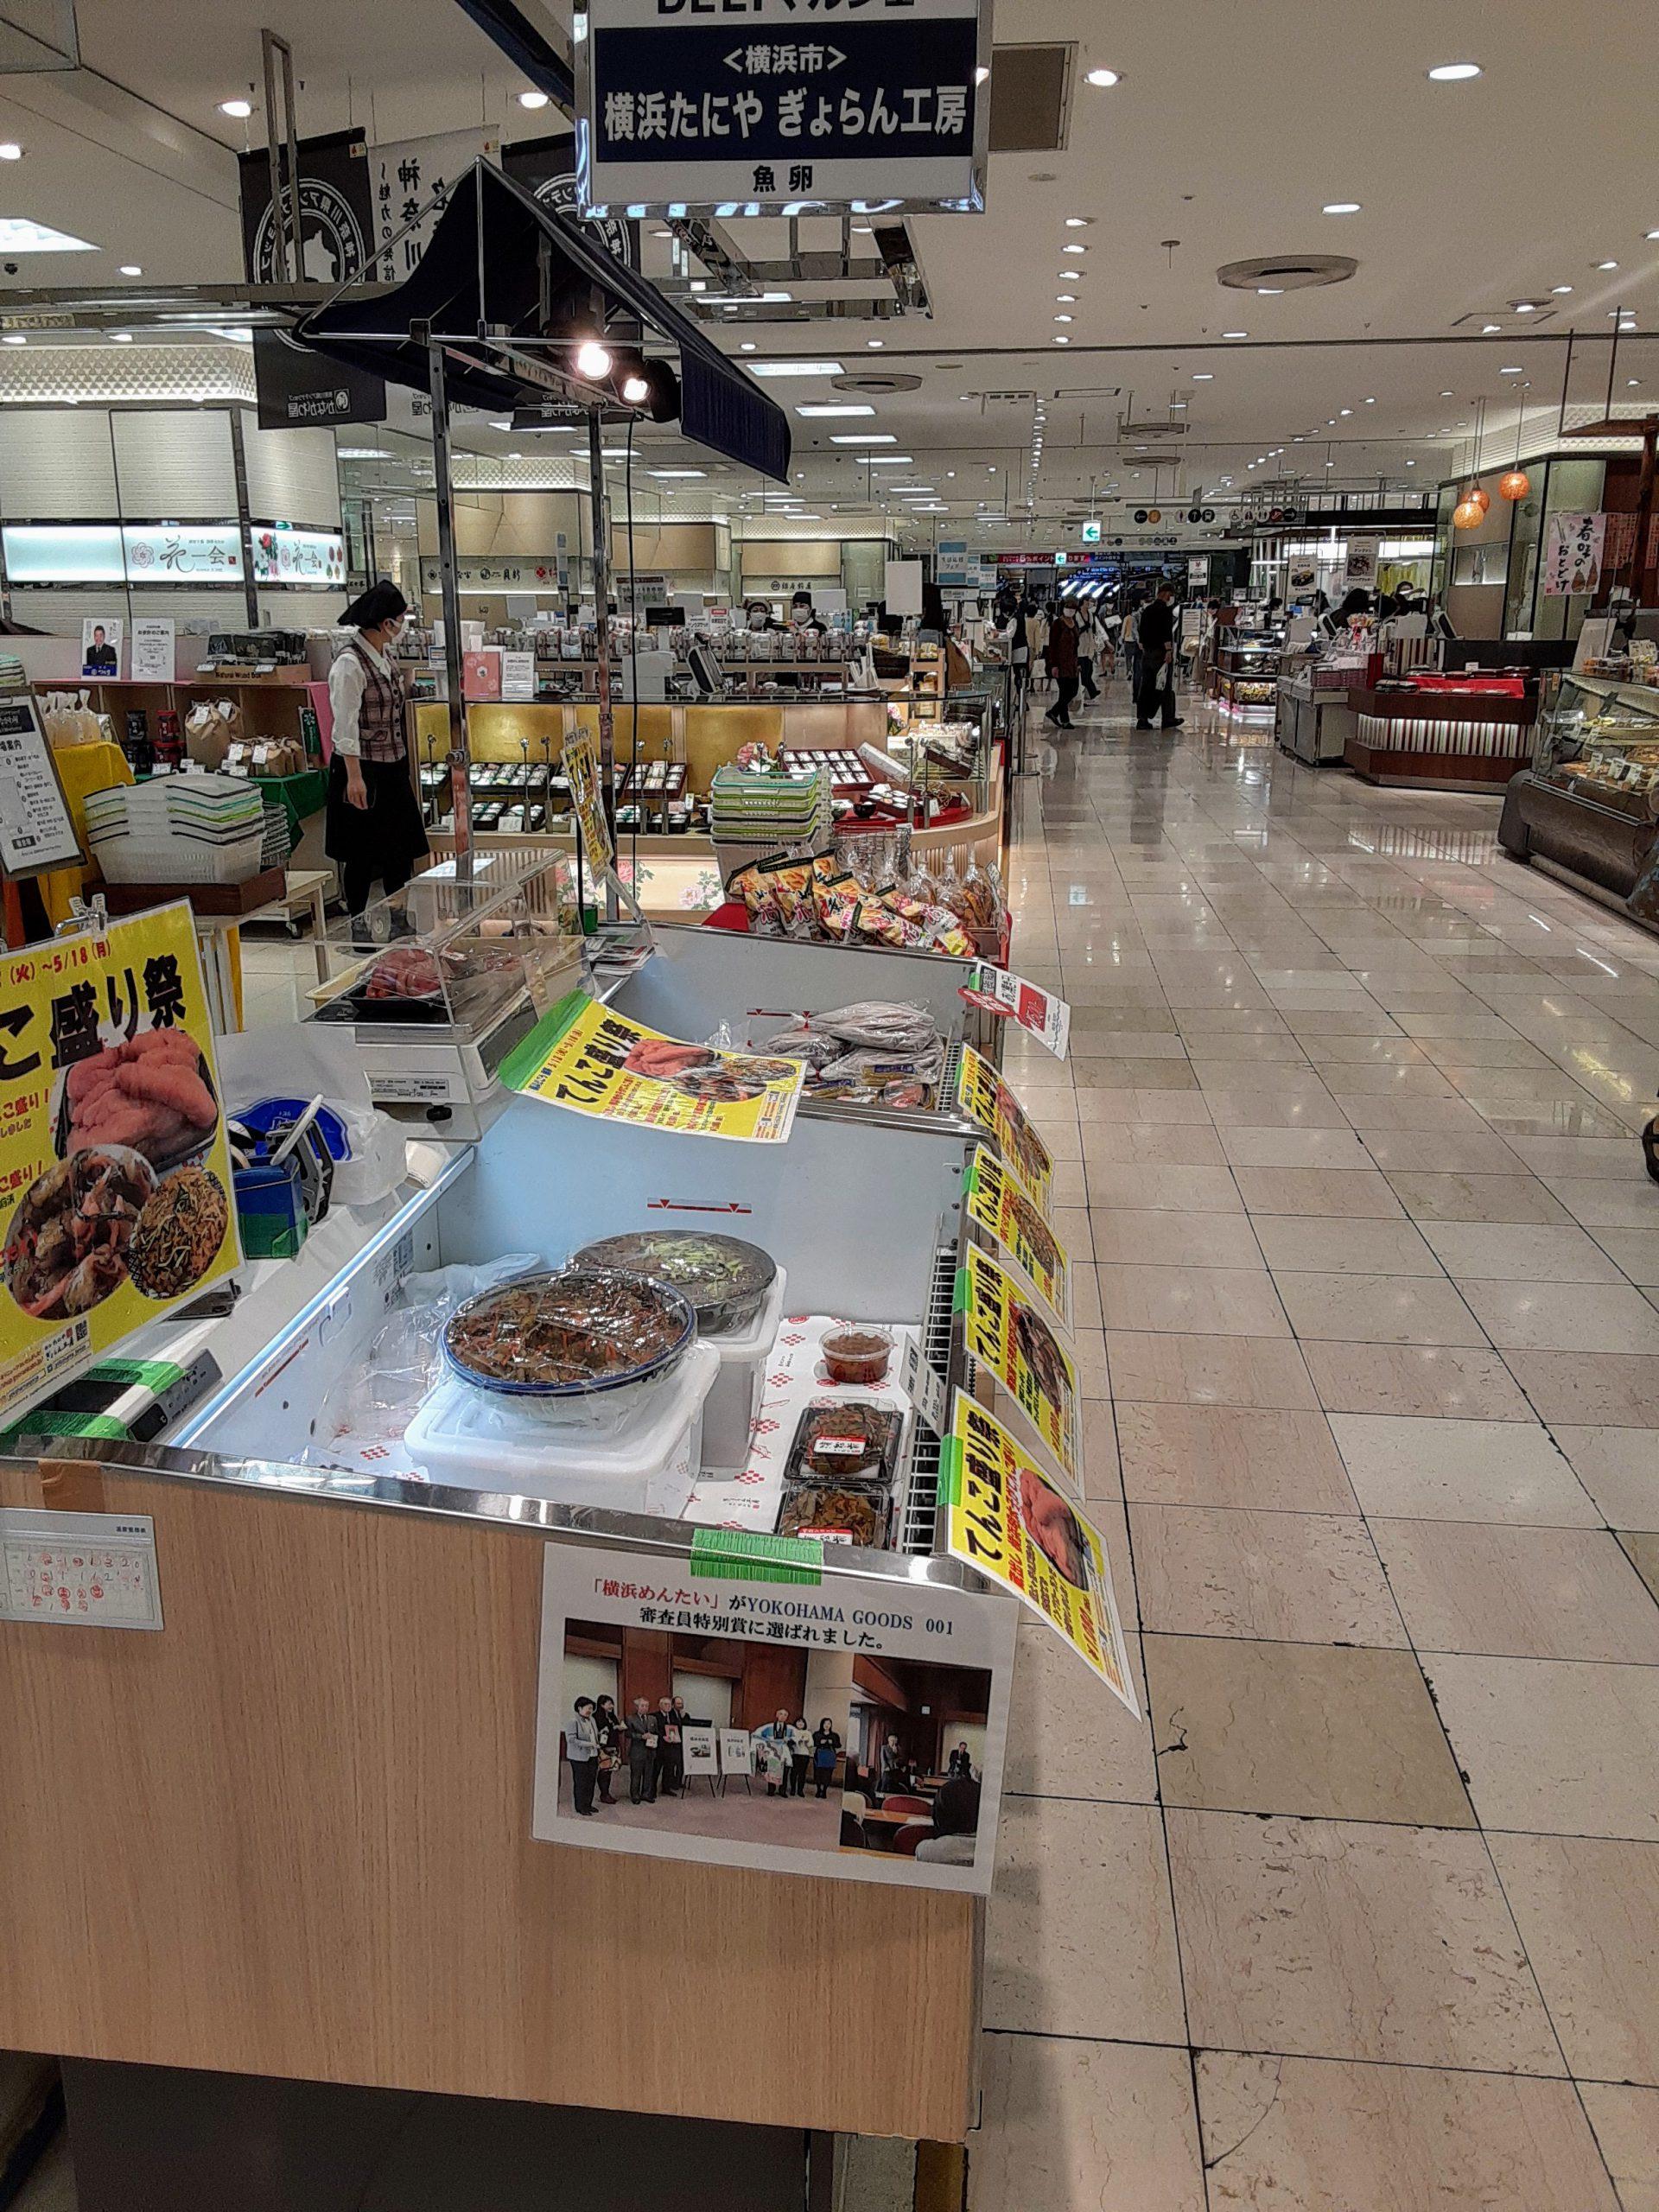 https://shop.gyorankobo.jp/wp-content/uploads/2020/10/ツイッター資料_そごう横浜店催事2020.5-scaled.jpg